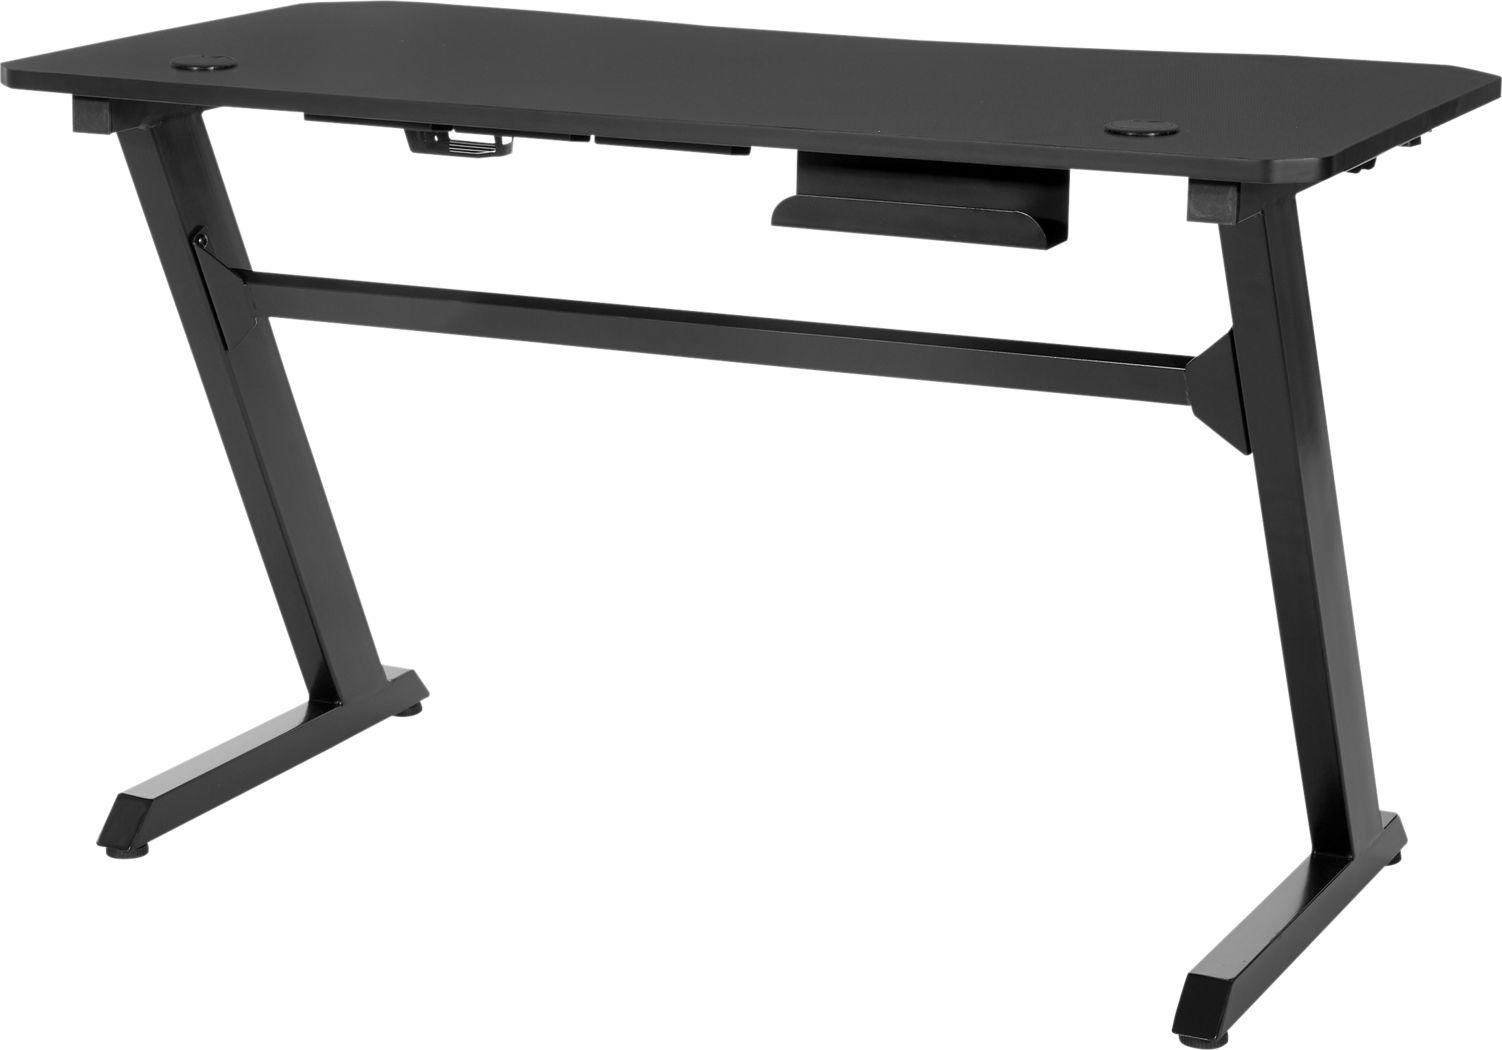 Treye Black Gaming Desk